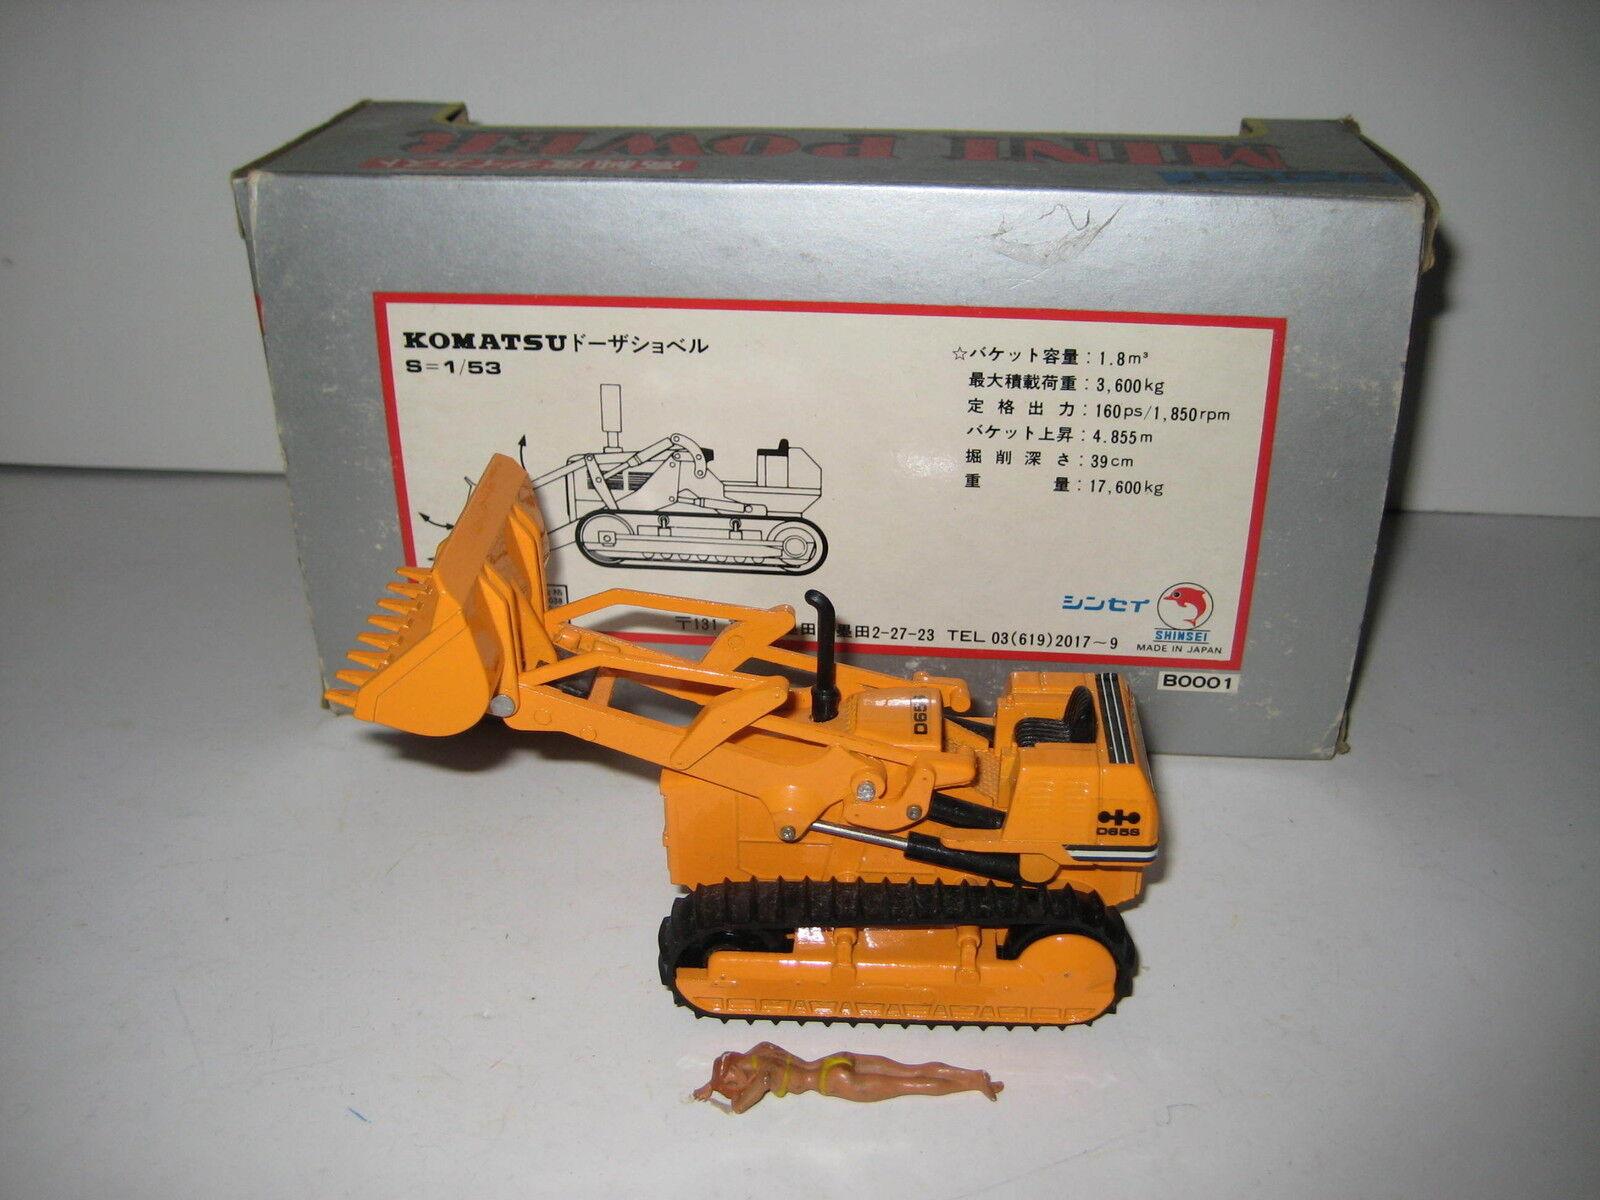 Pino d65s Cochegador naranja 6.Versión de New World 1  53 embalajes originales.